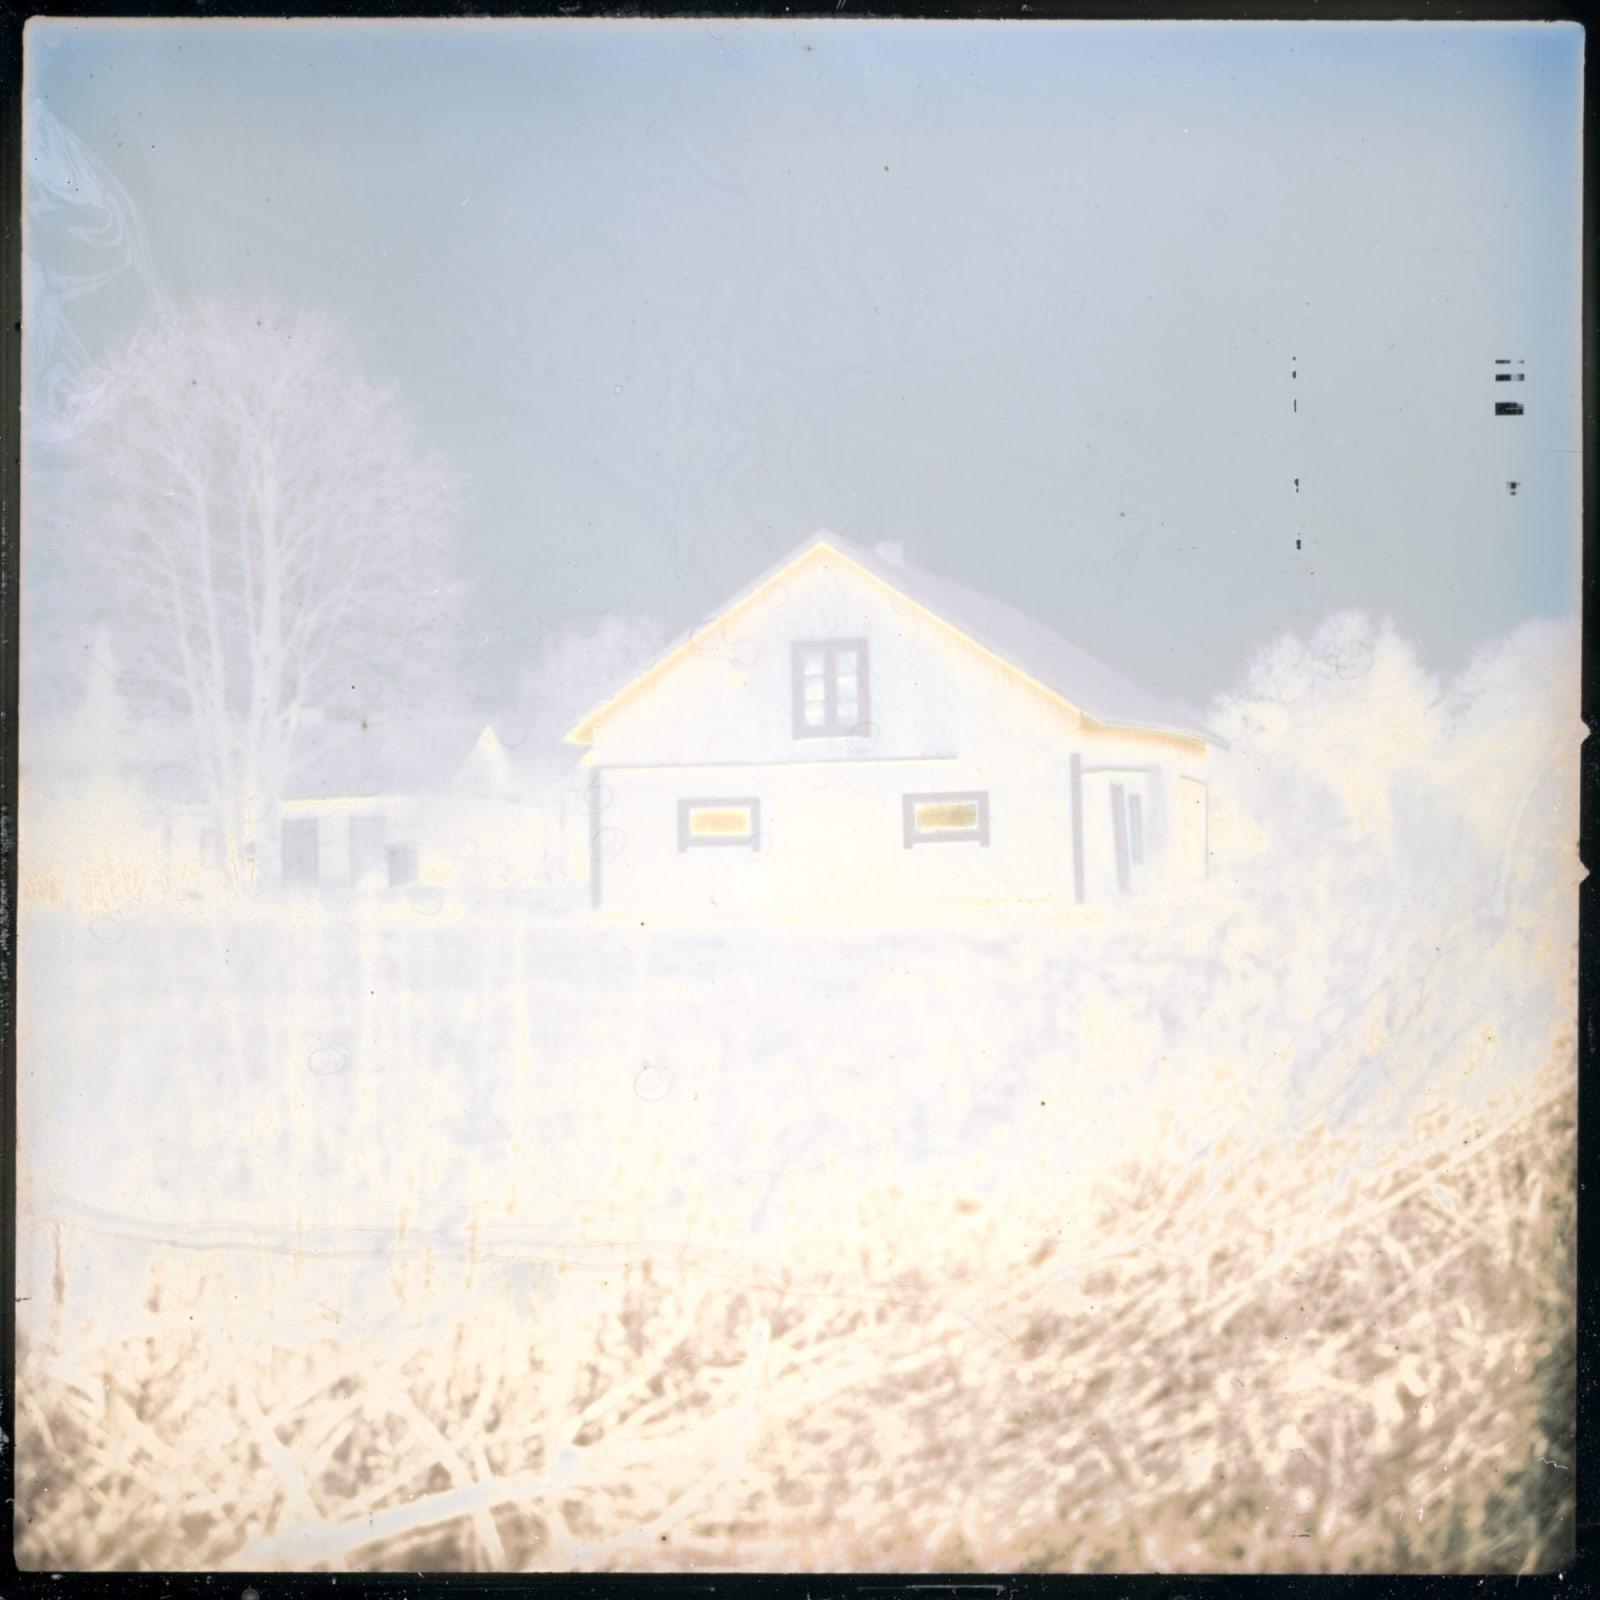 Takashi Arai, Reila House, November 18, 2017